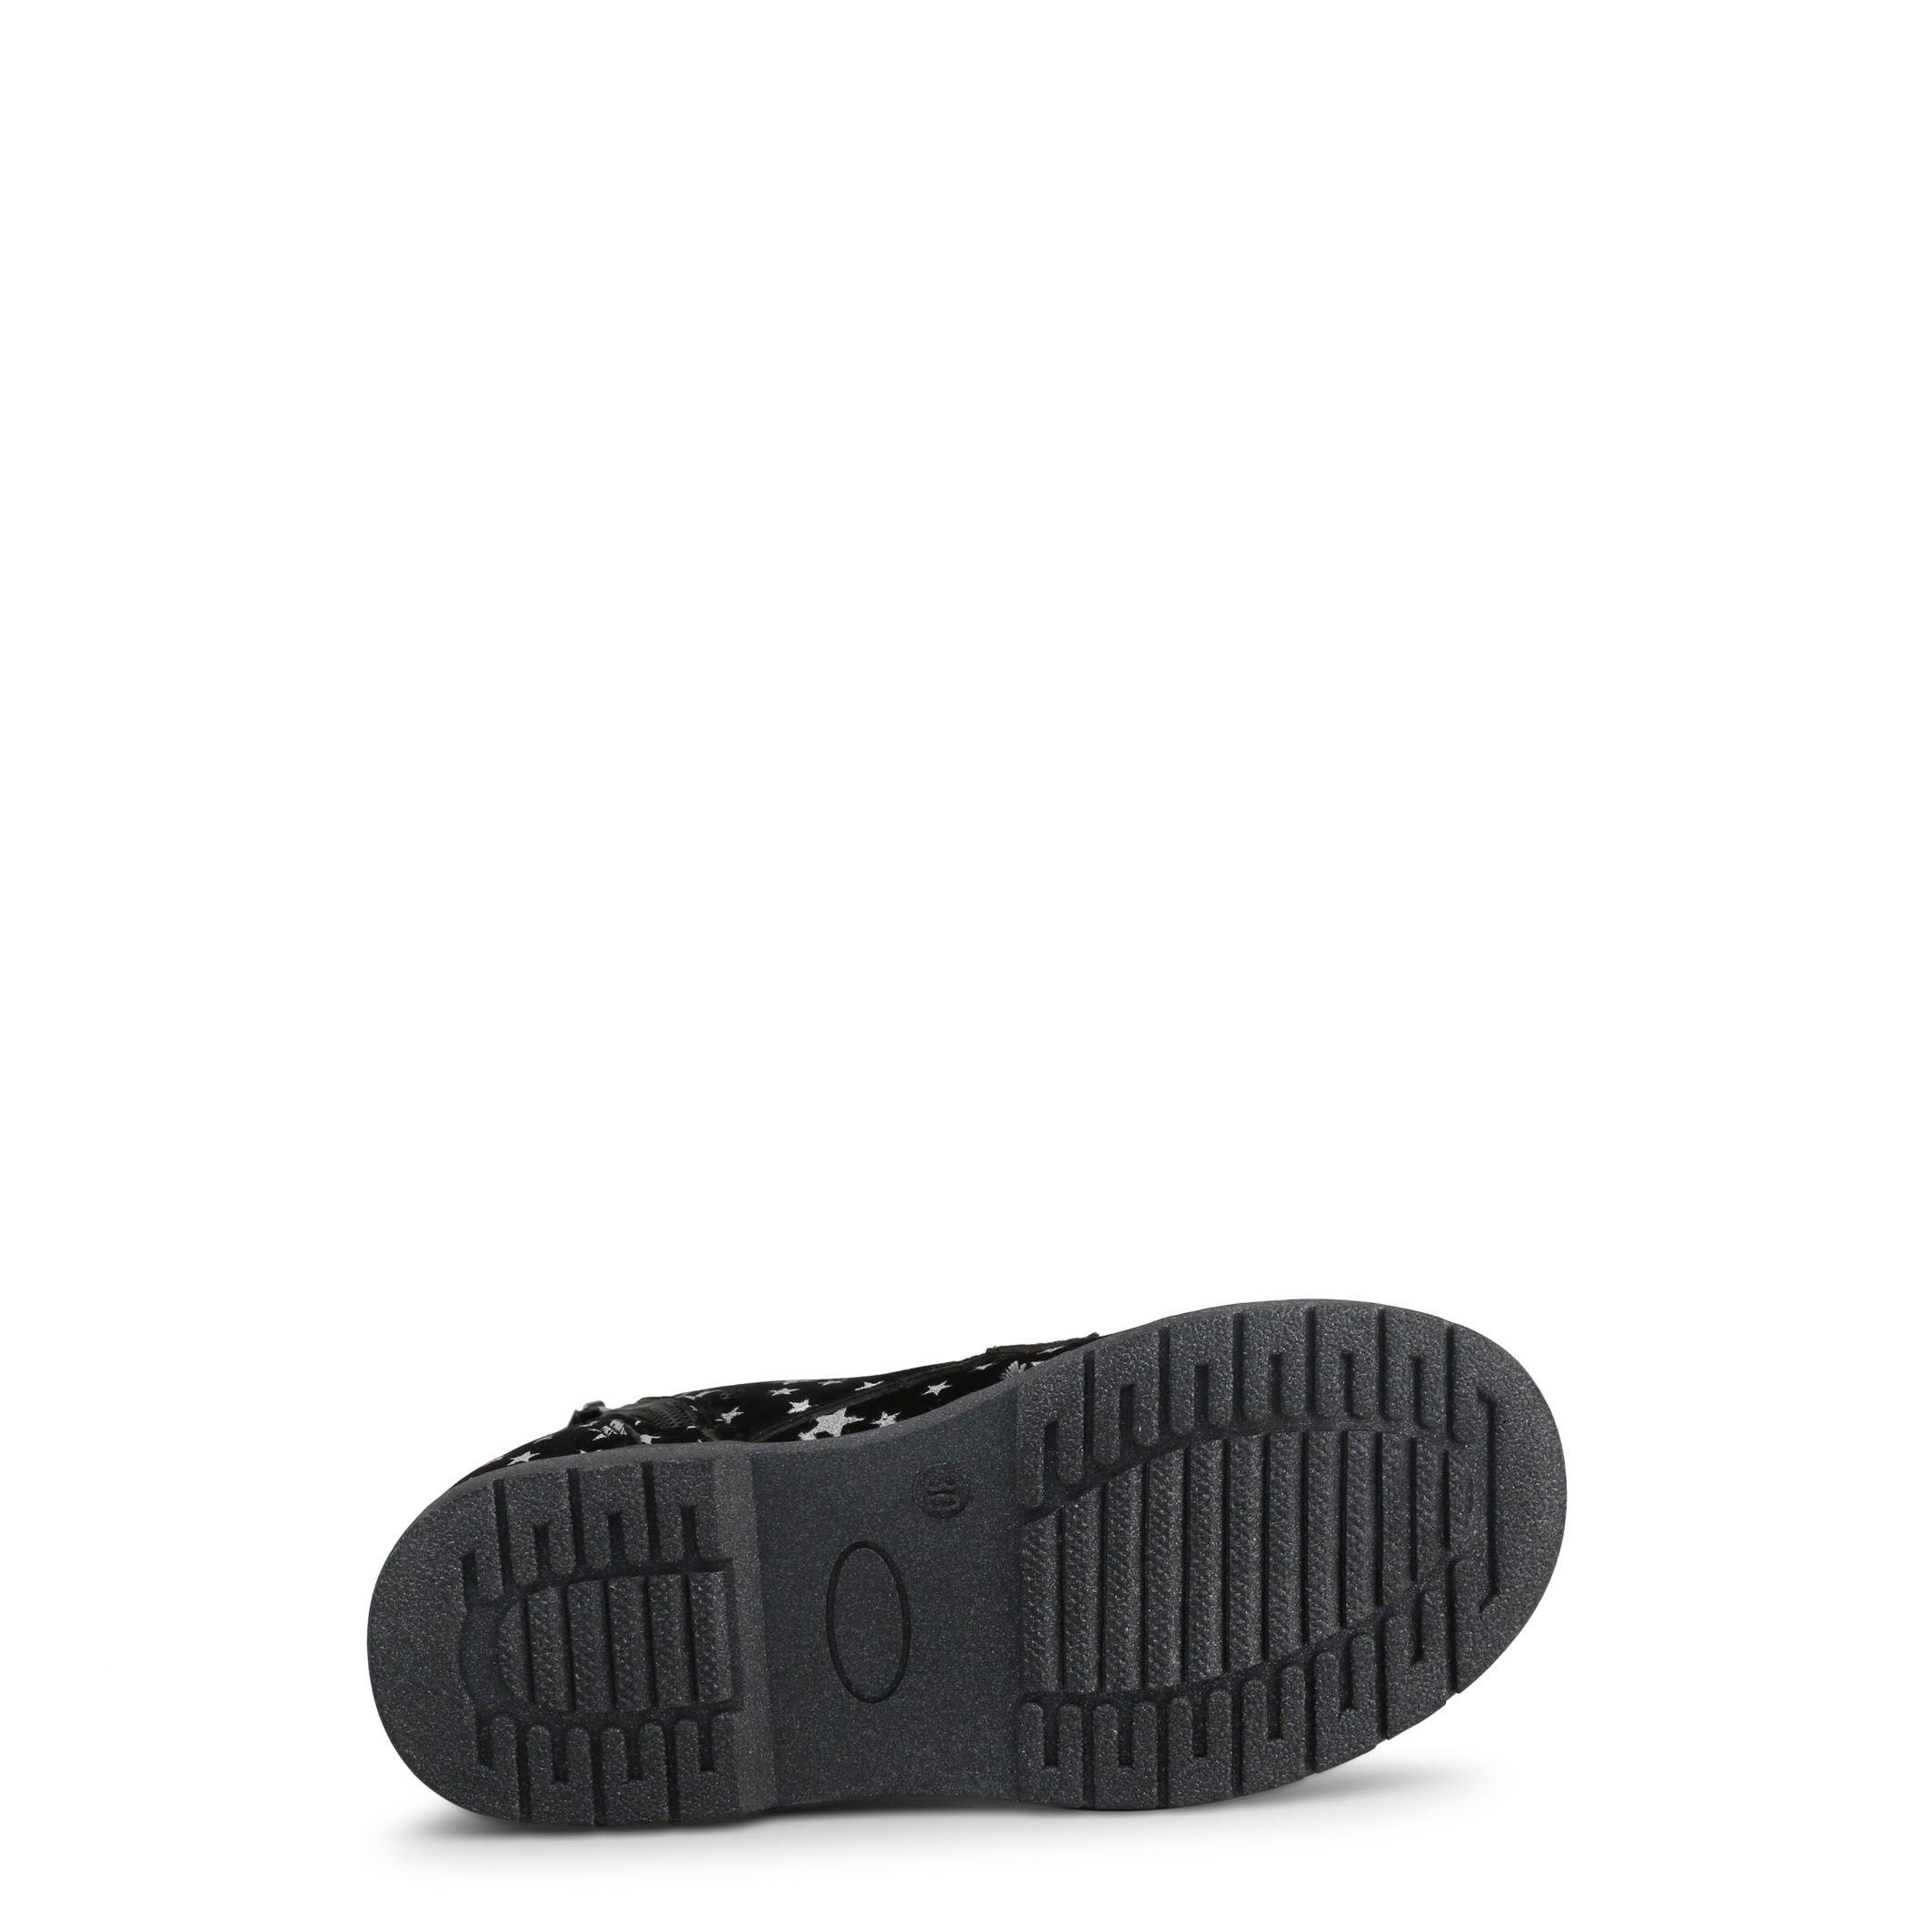 Shone – 3382-044 – Zwart Designeritems.nl